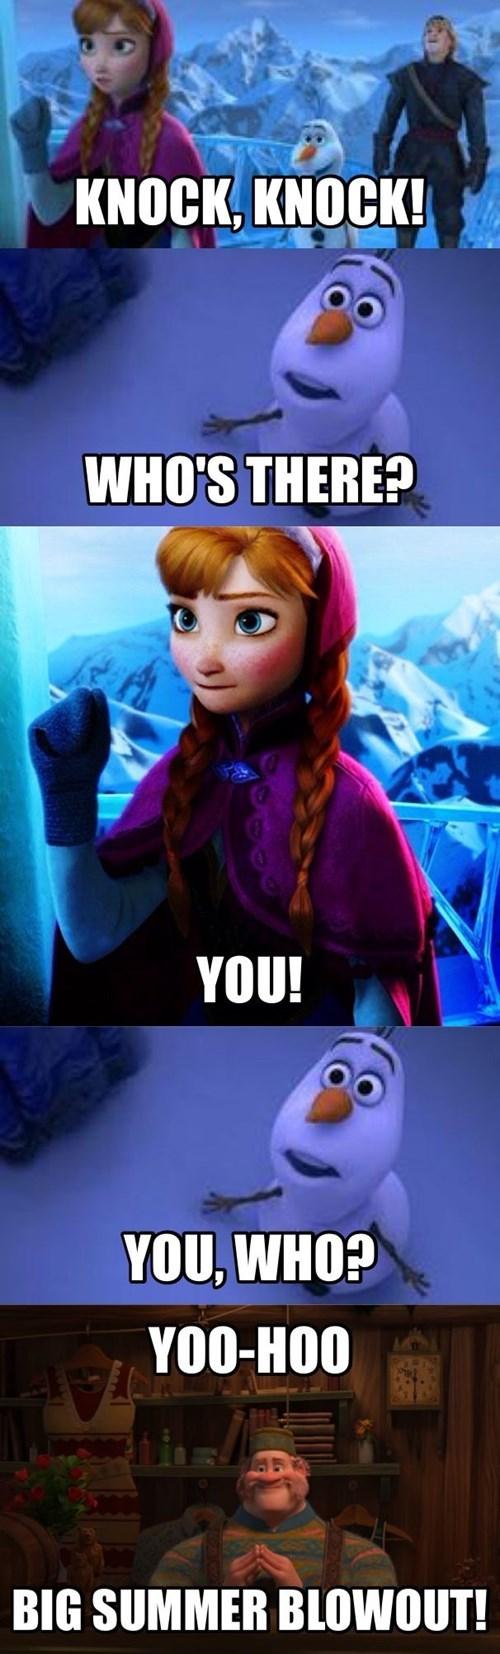 cartoon memes frozen knock knock big summer blowout